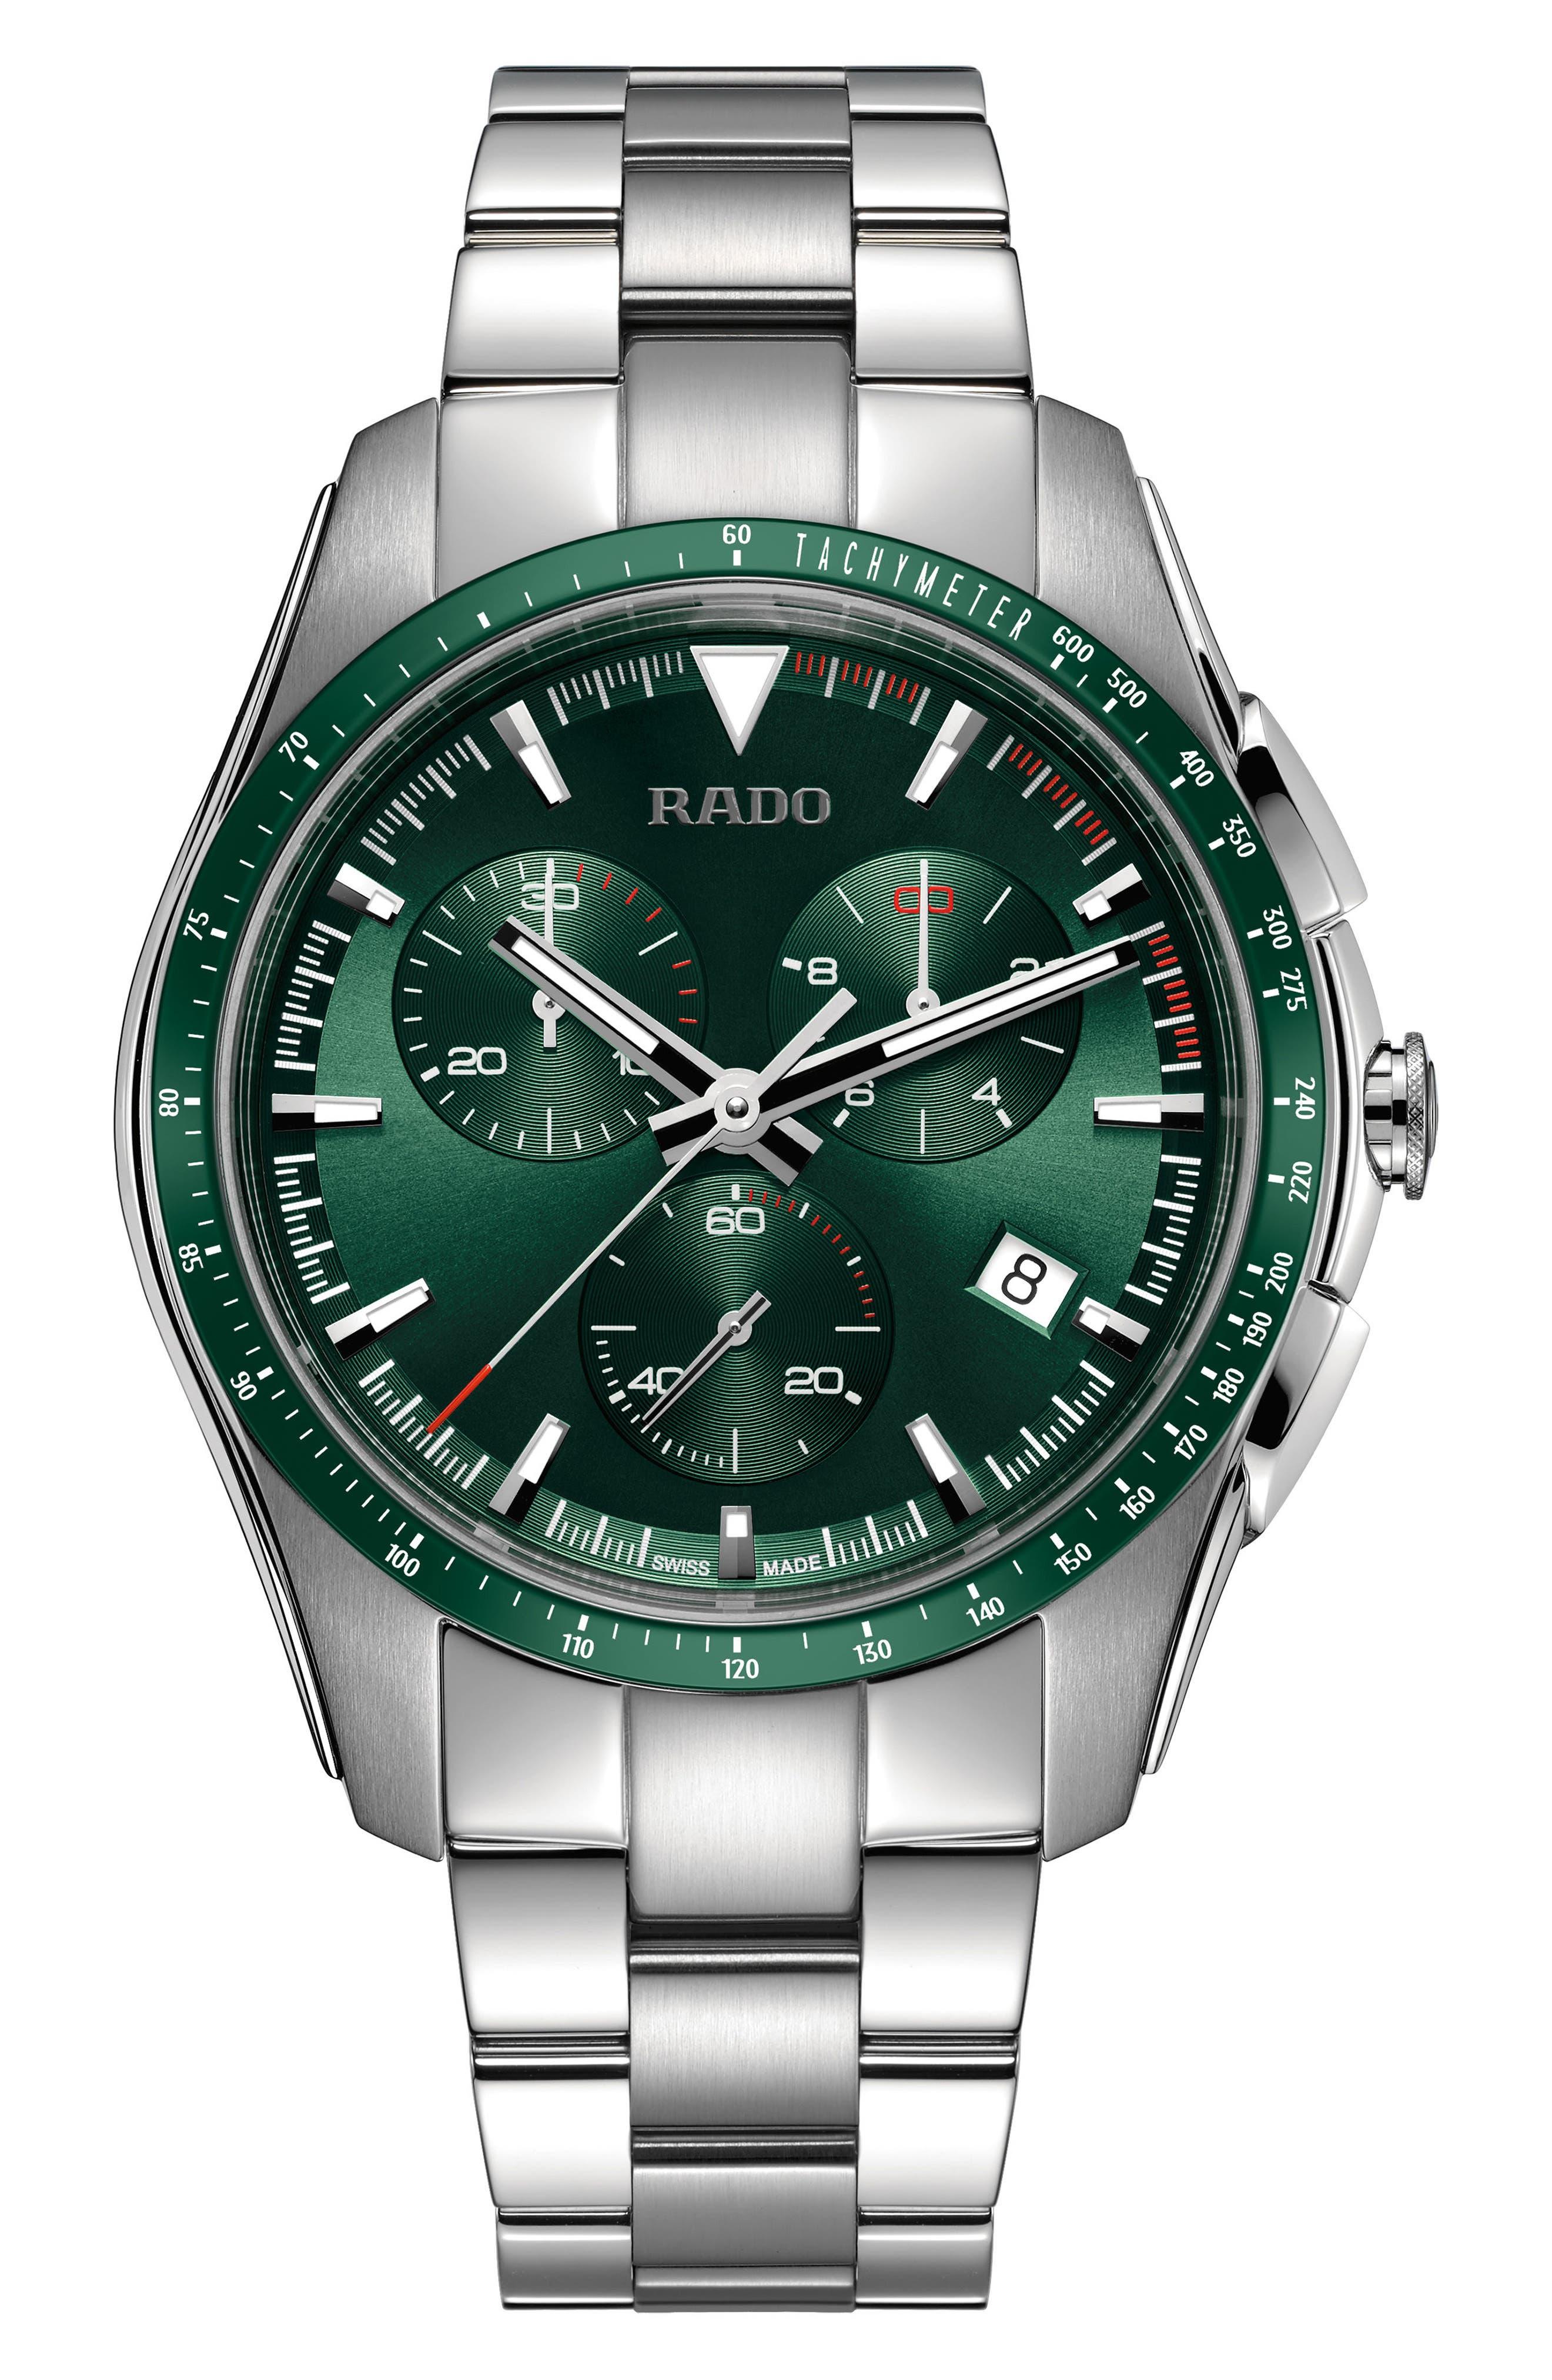 Main Image - RADO HyperChrome Chronograph Bracelet Watch, 44.9mm